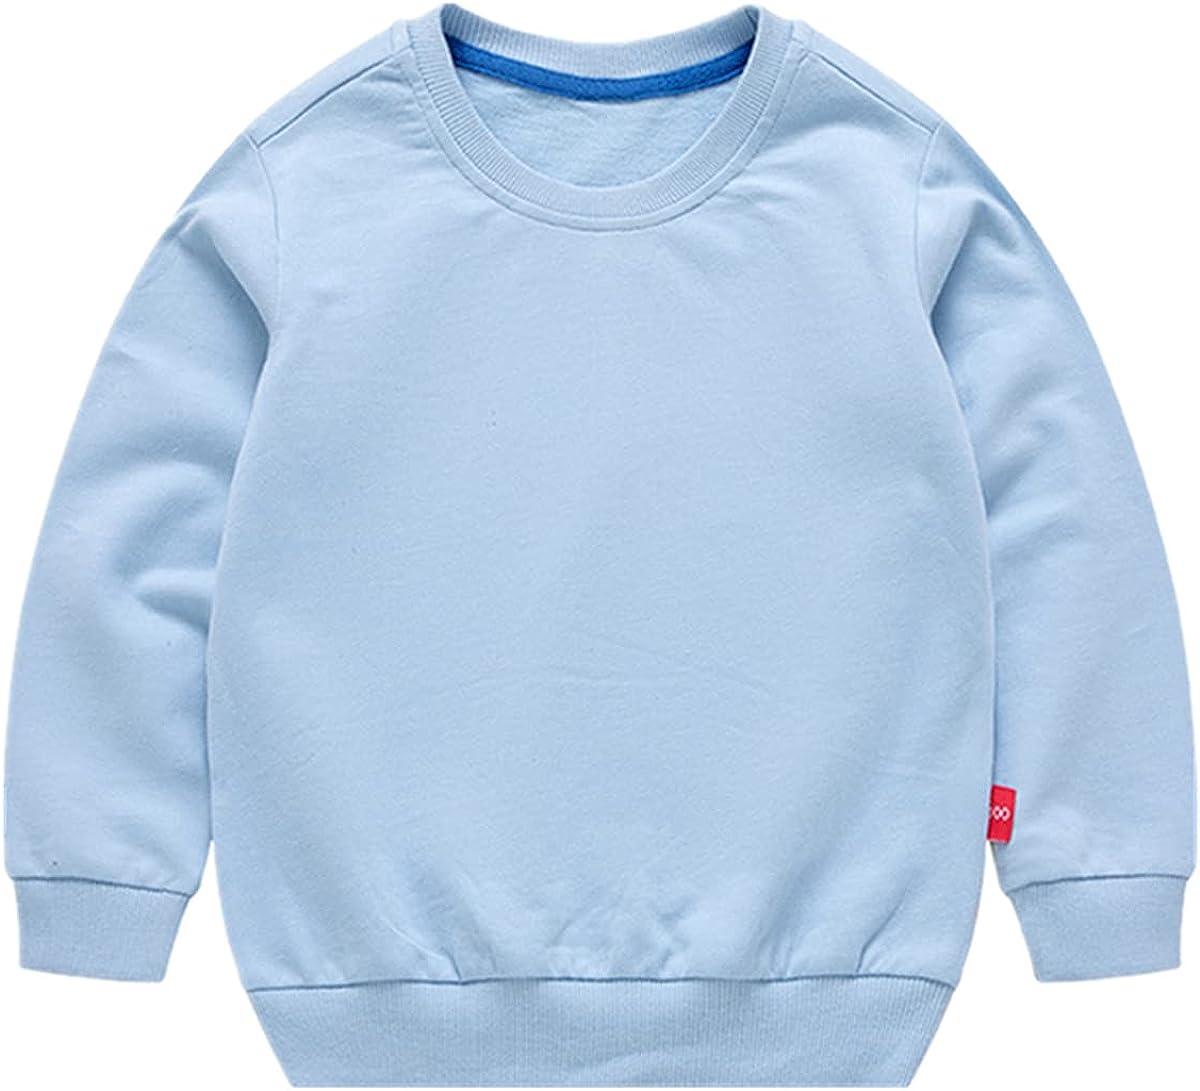 AdaliaFaye Boys' Crewneck Sweatshirt Girls Sport Long Sleeve Cotton Kids Toddler Casual Solid T-Shirt Pullover Tops